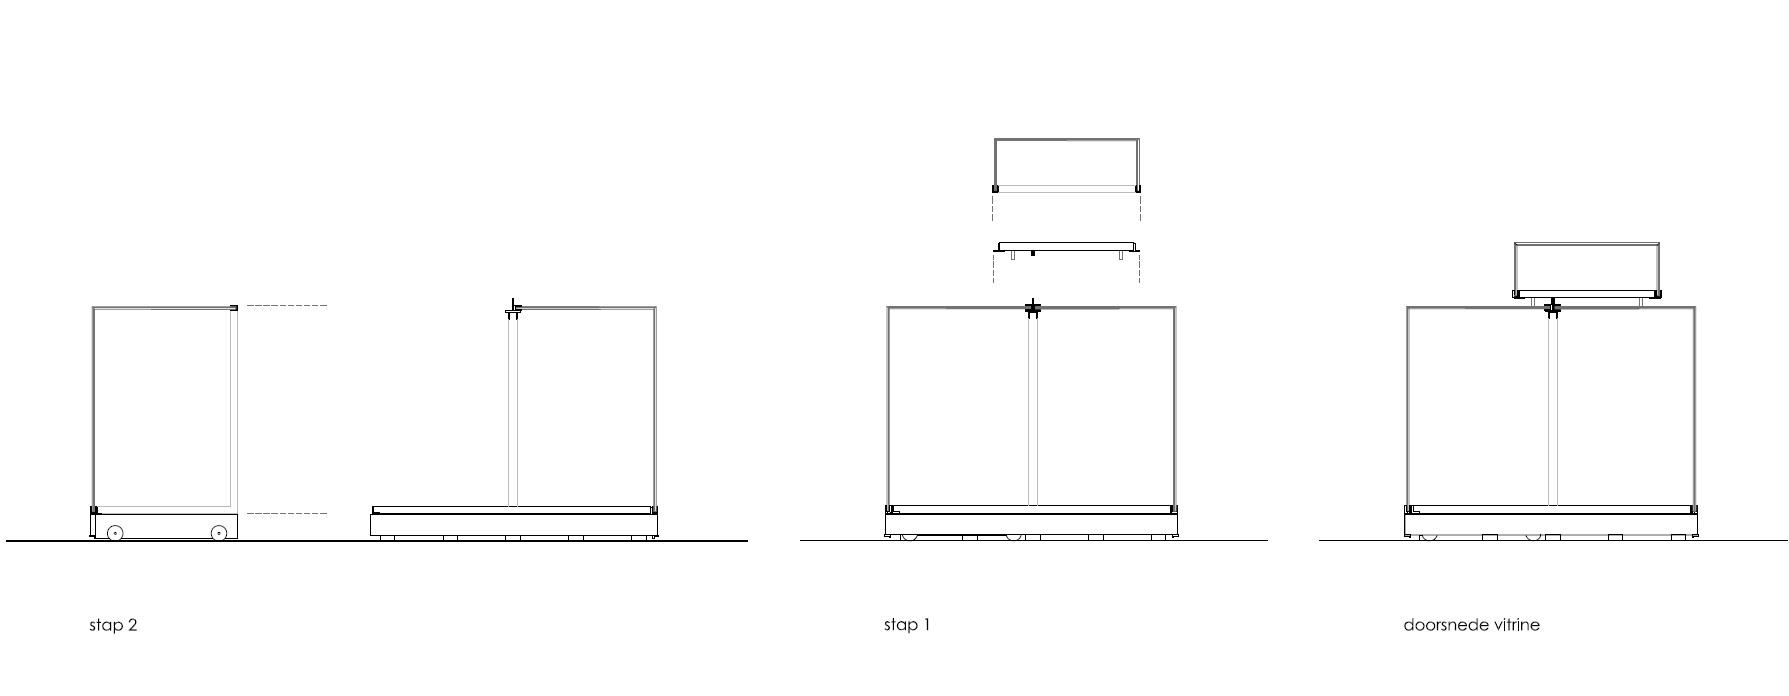 principe vitrine - Vitrine ontwerp